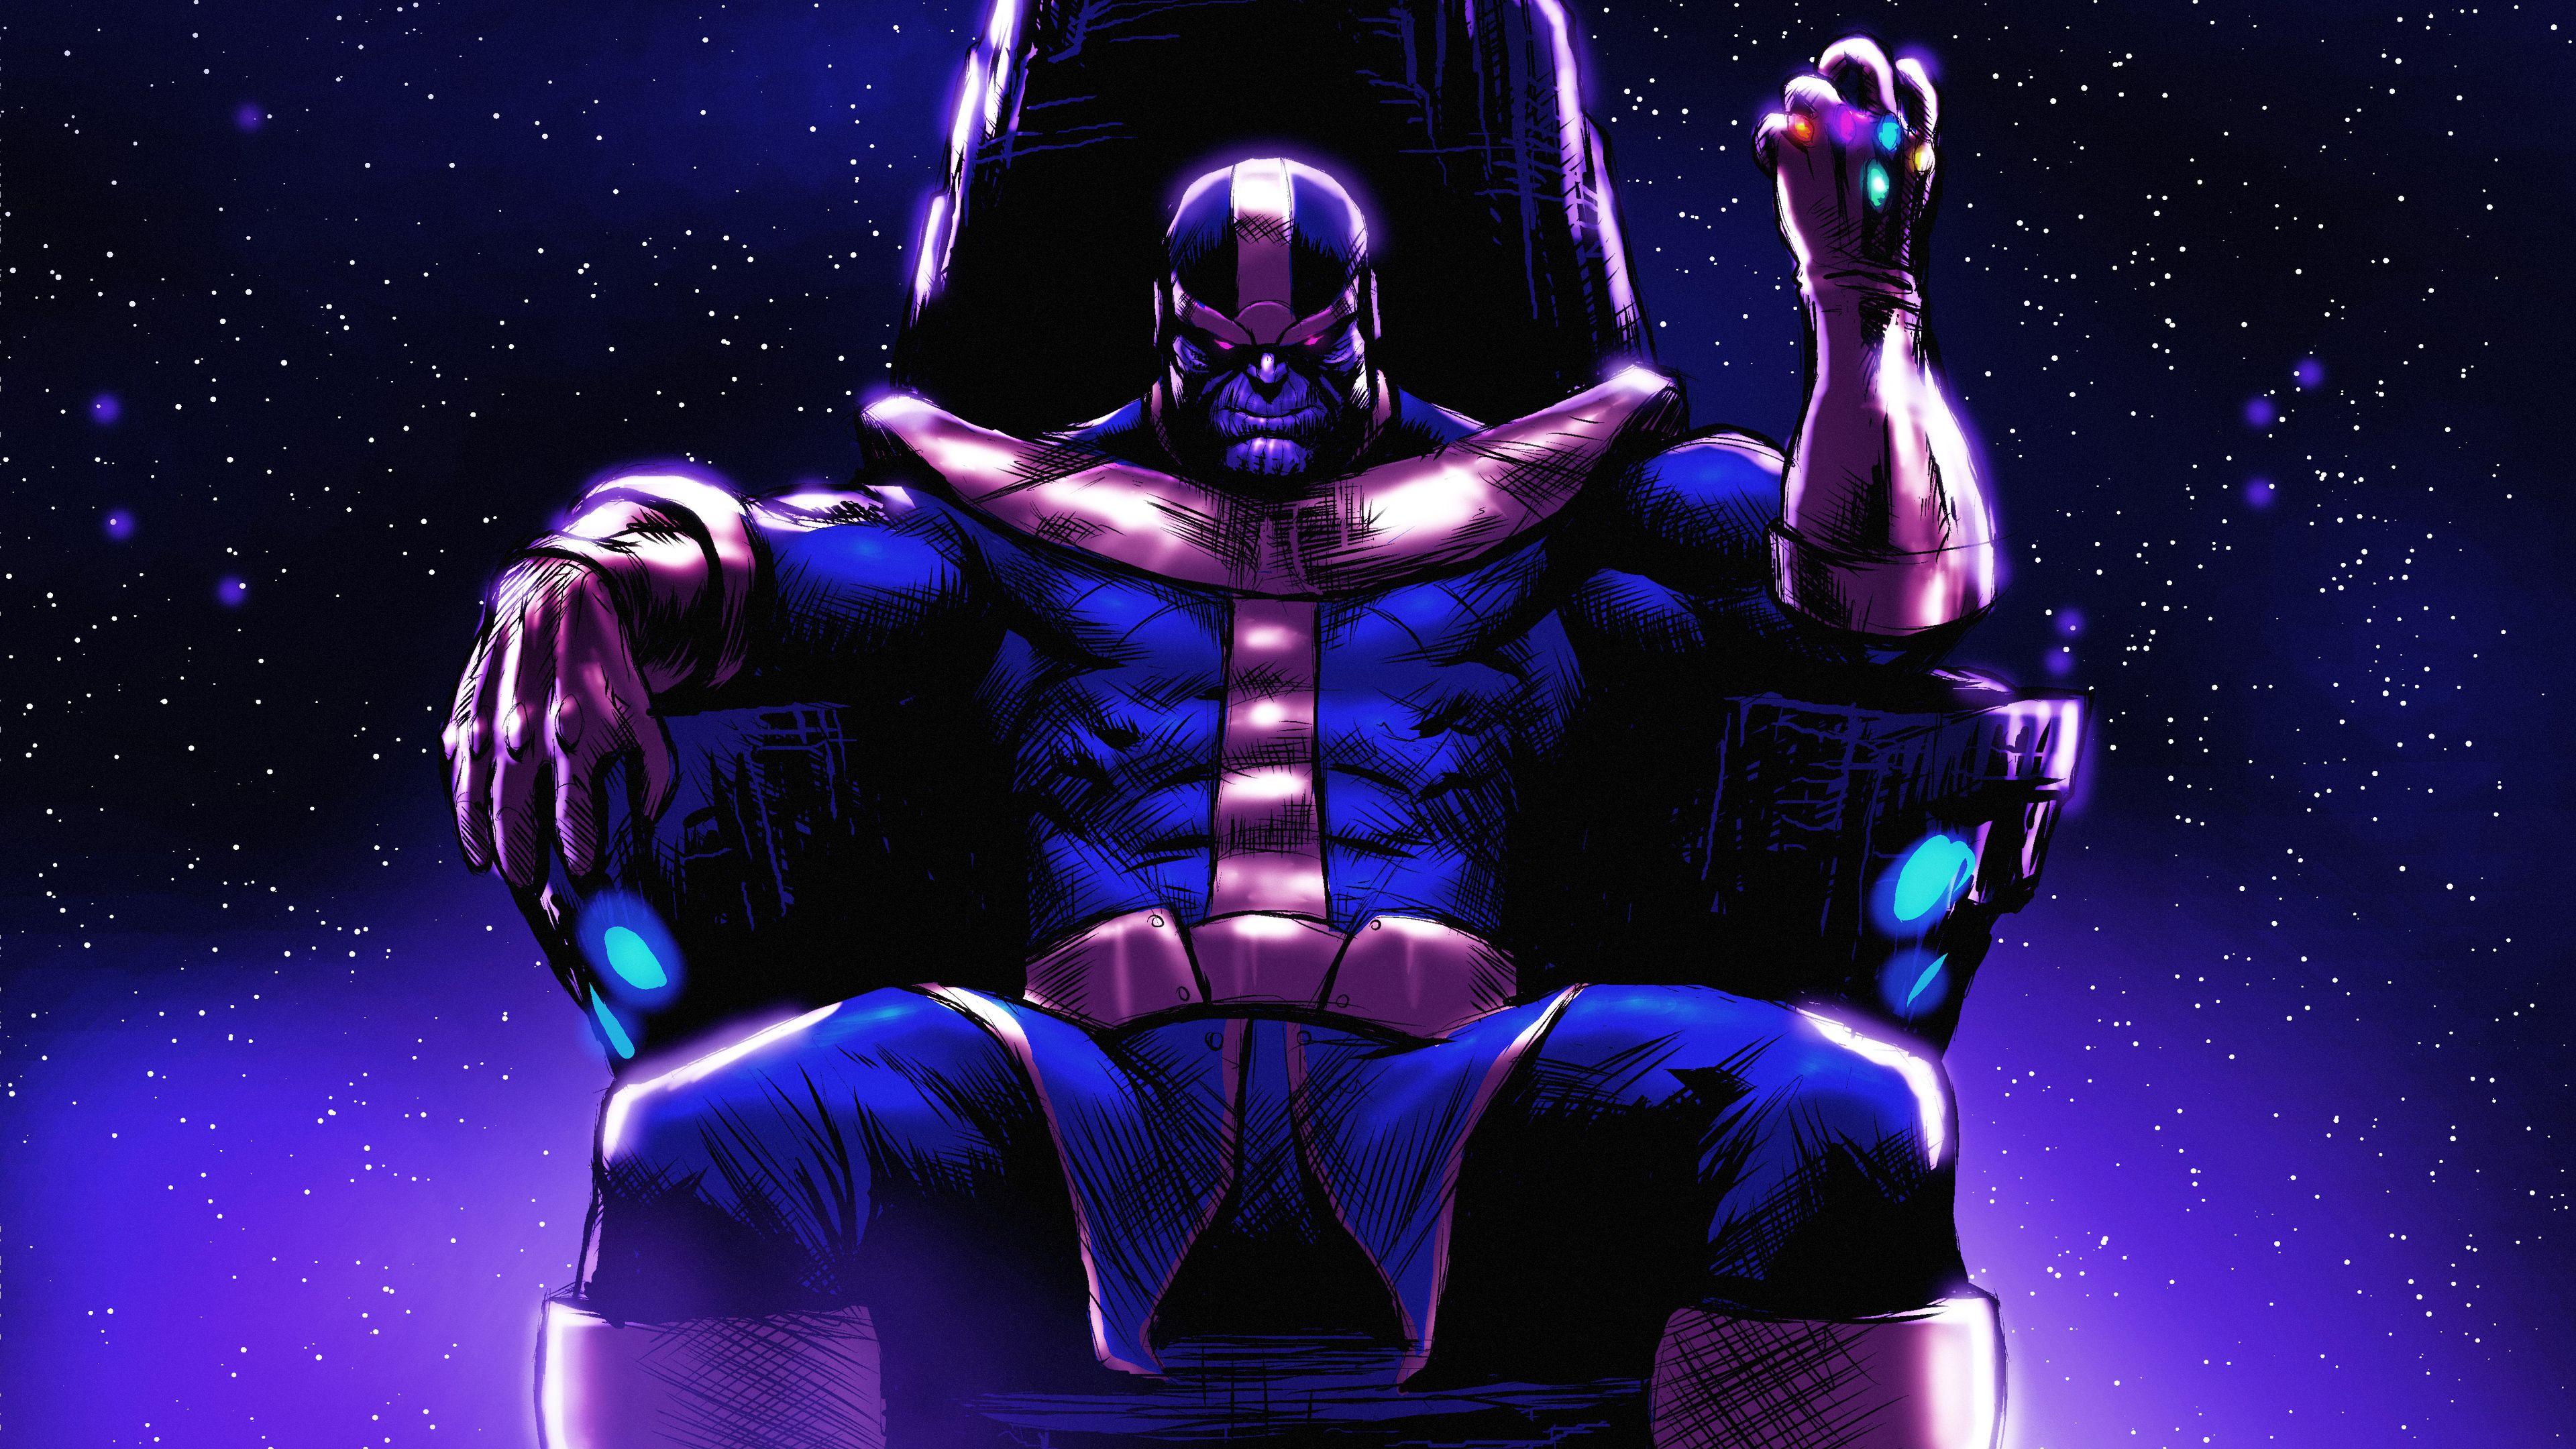 Thanos On His Throne Thanos Wallpapers Superheroes Wallpapers Hd Wallpapers Digital Art Wallpapers Deviantart Wallpapers Art Wallpaper Hero Wallpaper Art